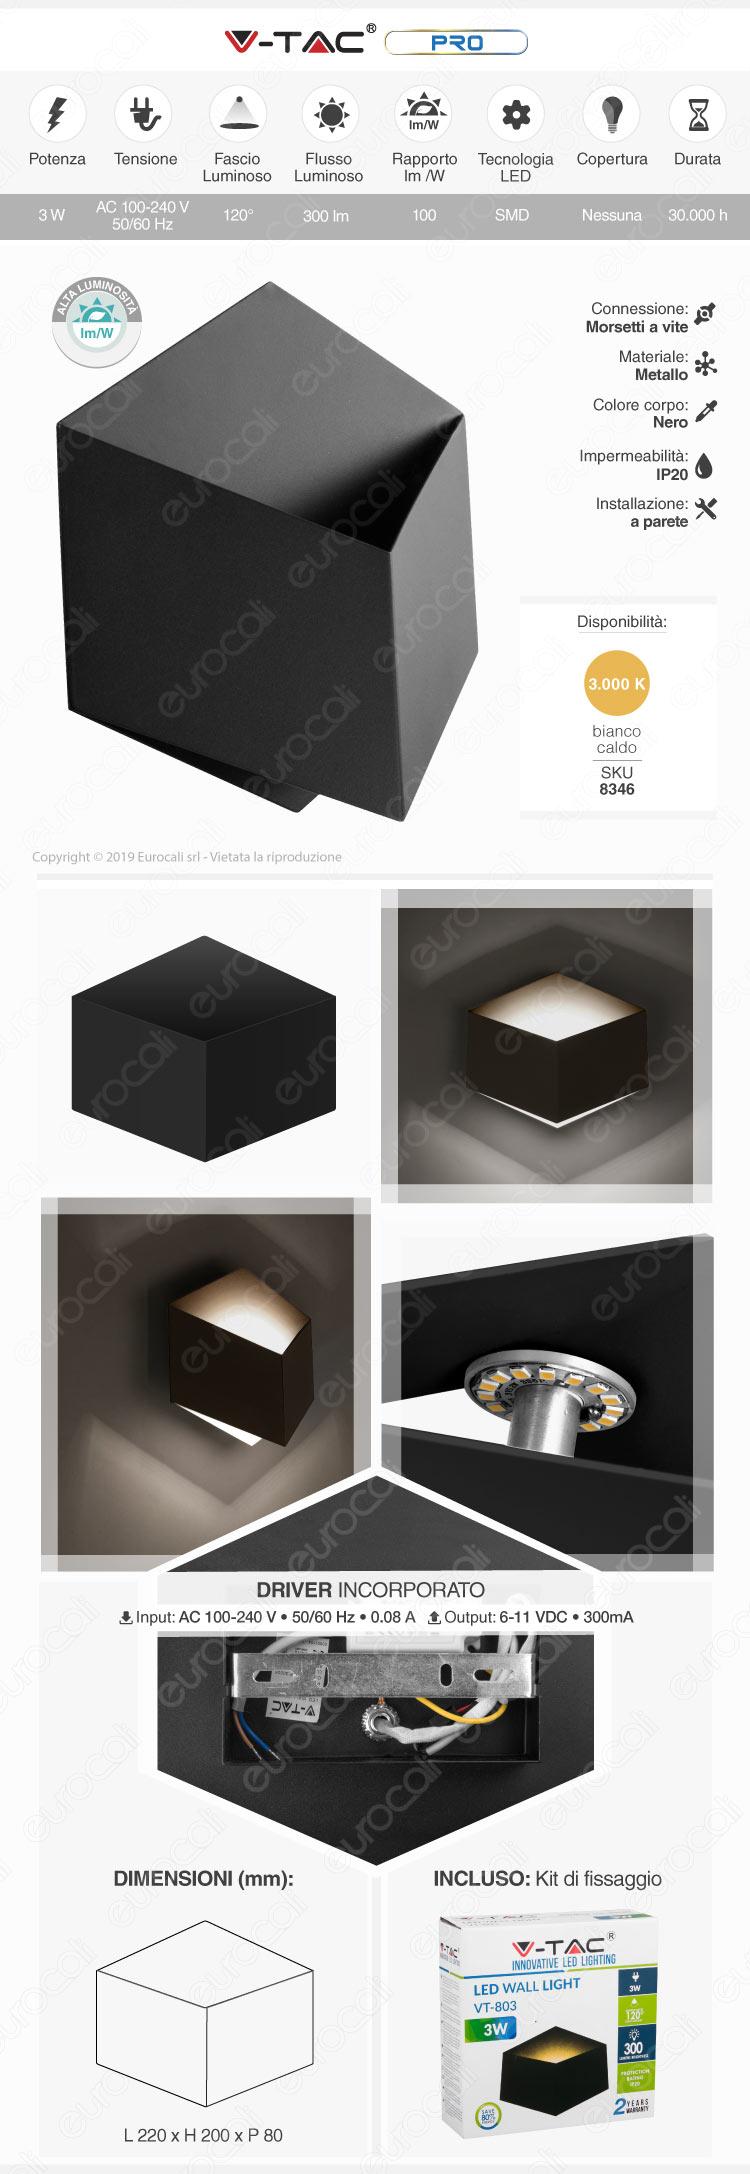 V-Tac VT-803 Lampada LED da Muro Wall Light Nero 3W